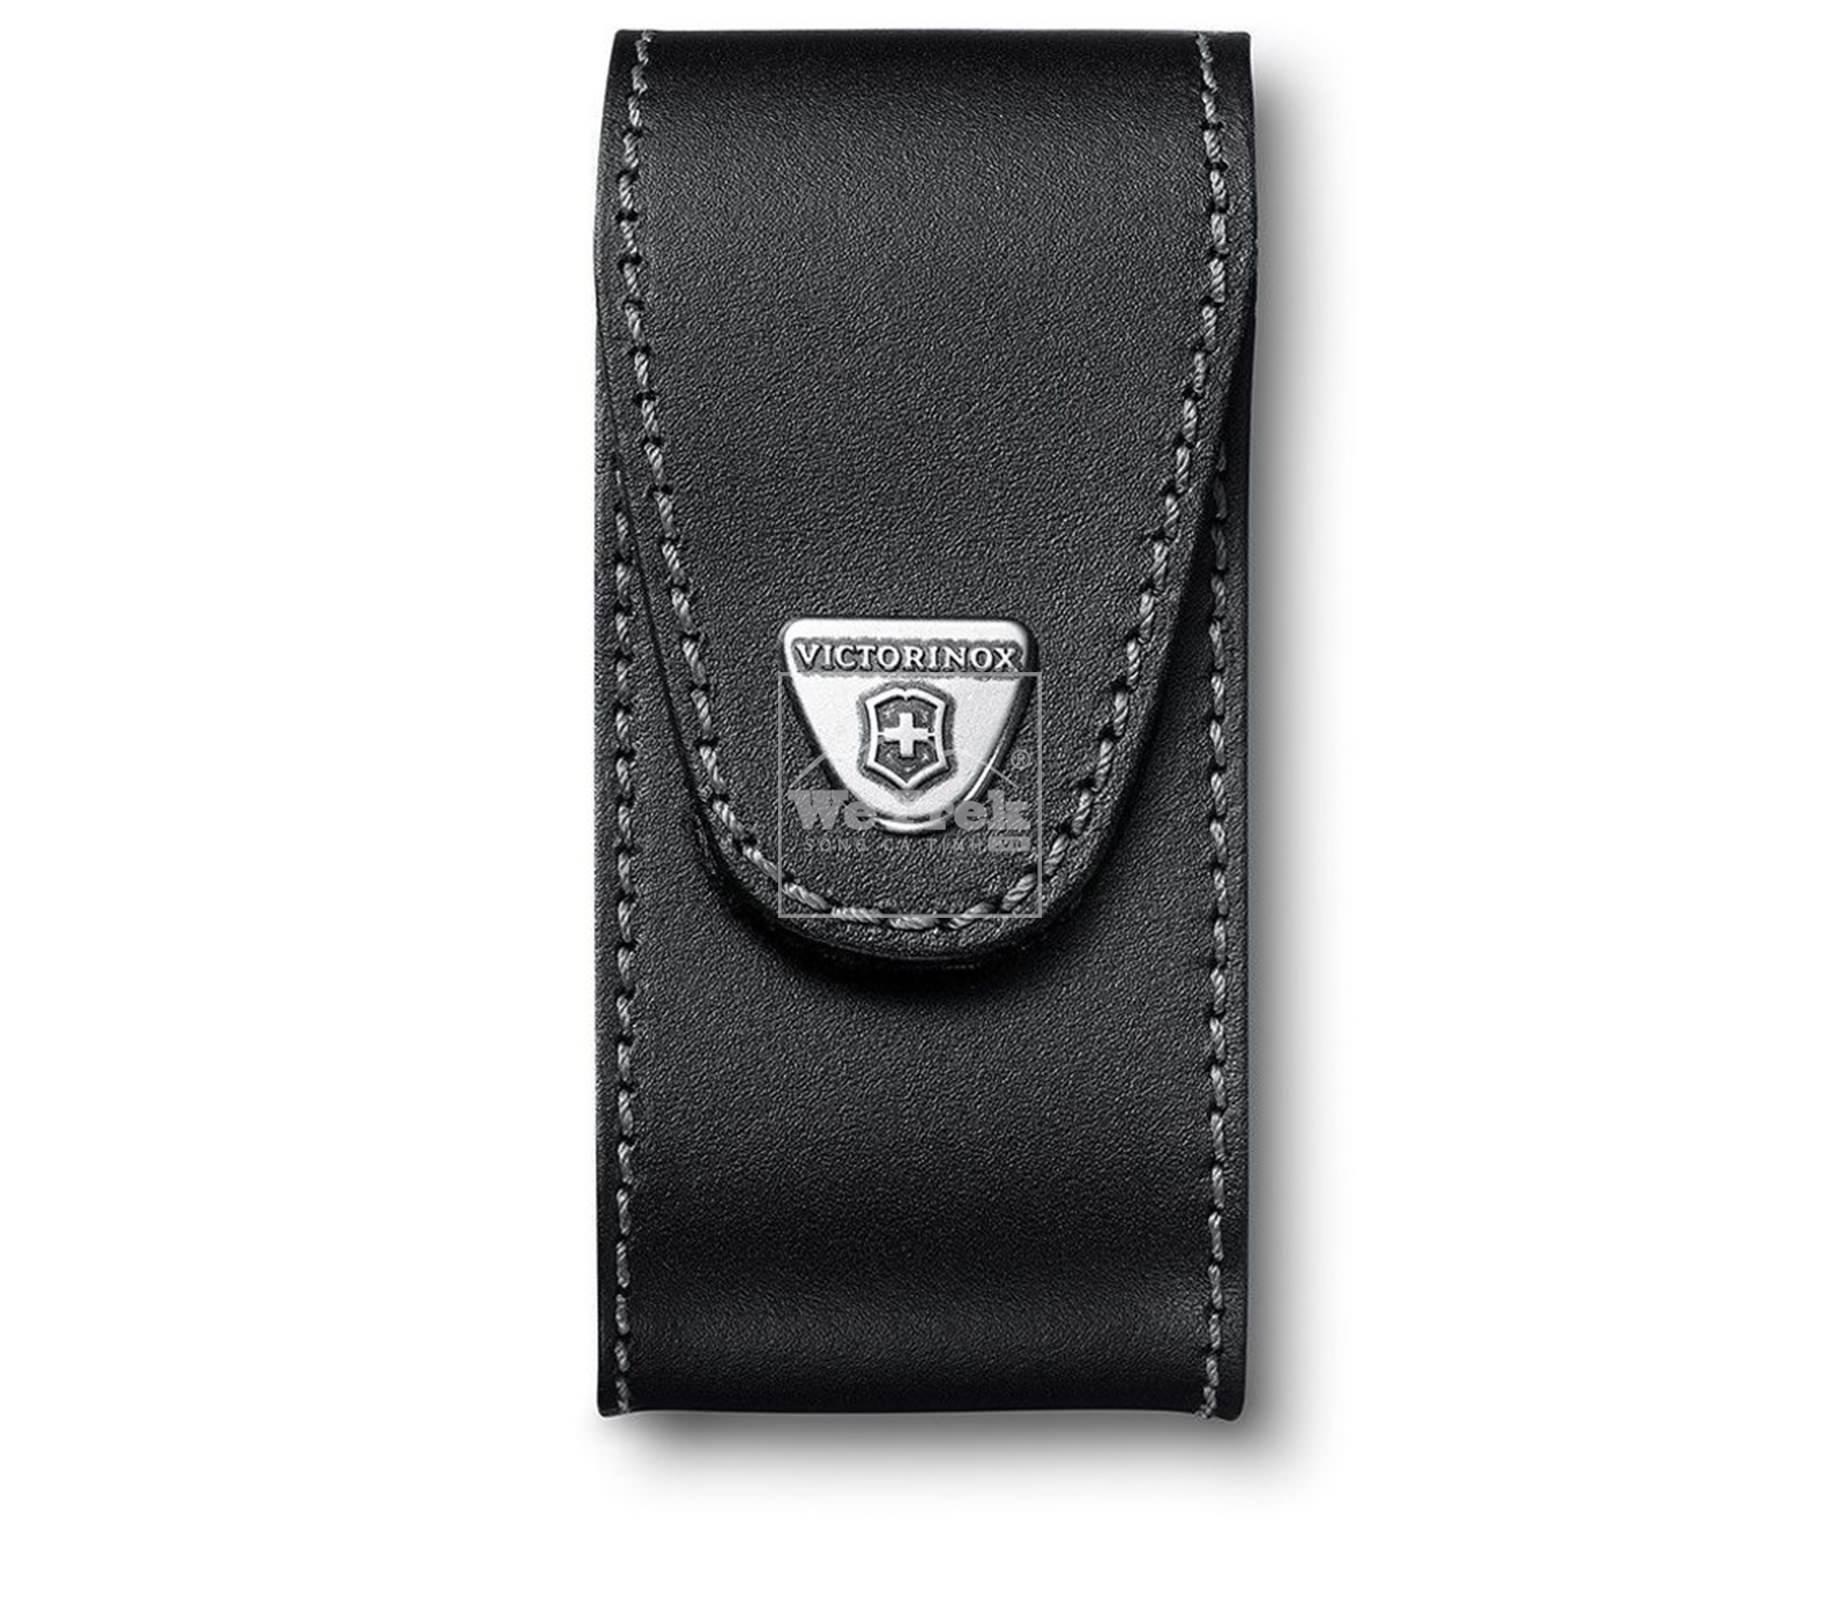 Bao da dao đa năng VICTORINOX Leather Pouch 4.0524.XL - 6979